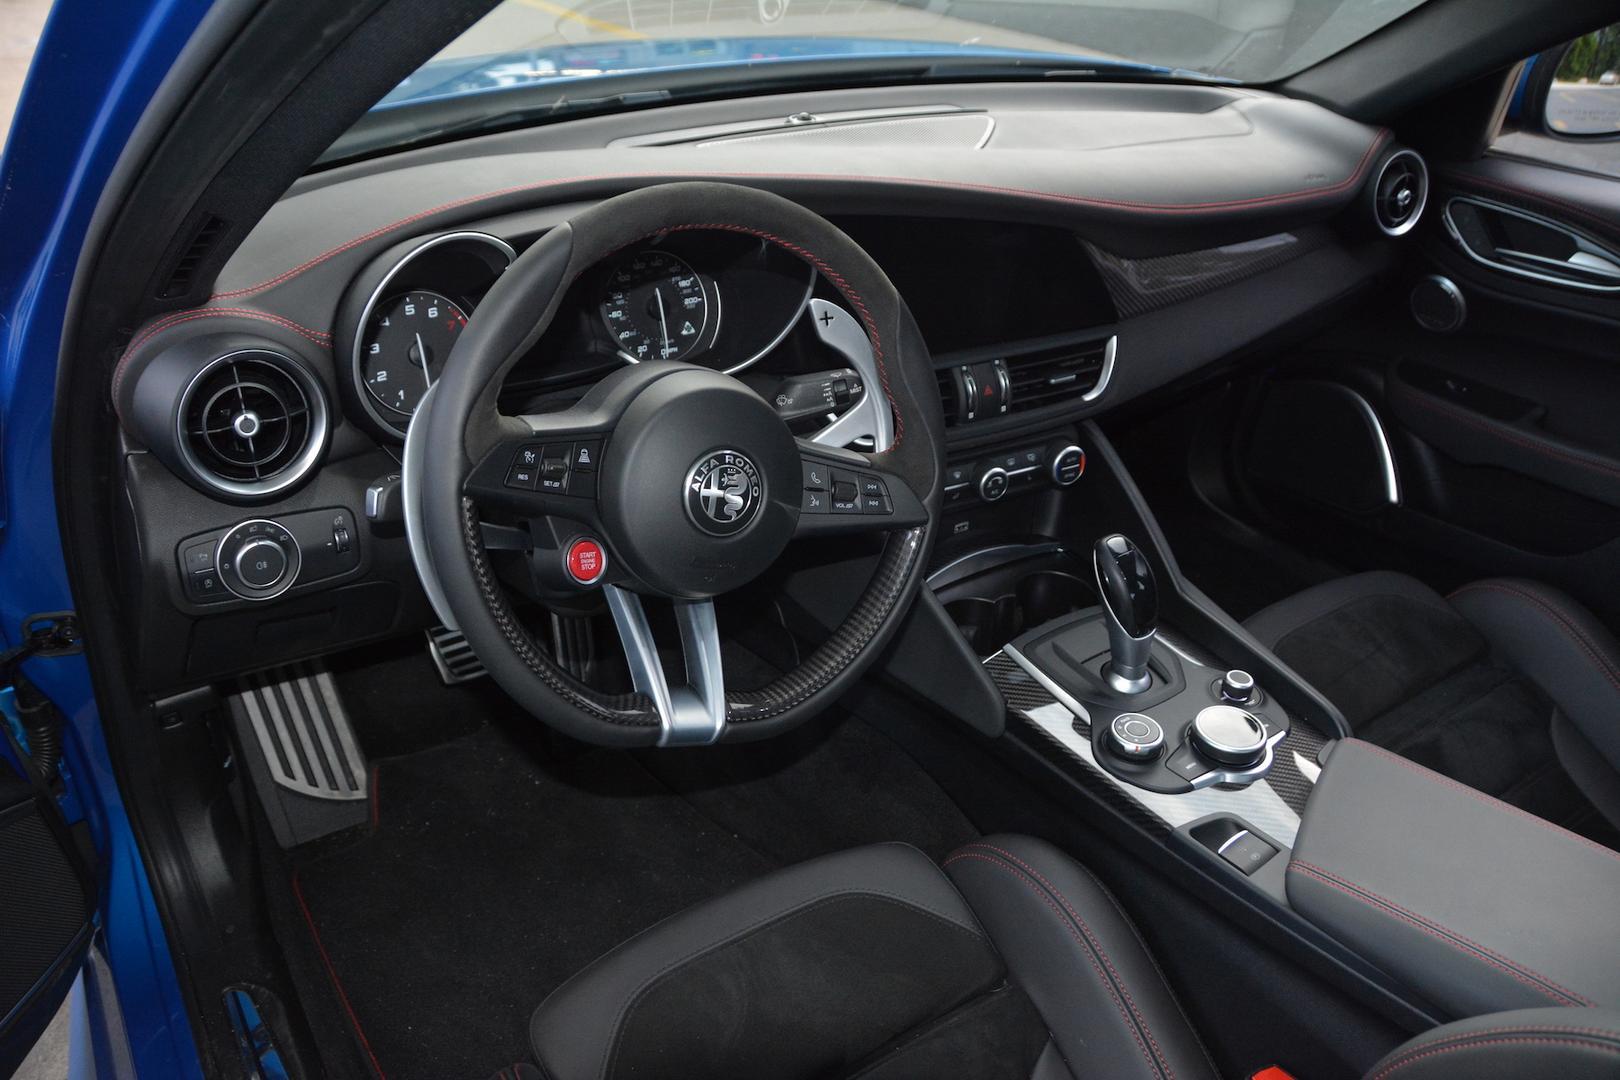 2019 Alfa Romeo Giulia QV Steering Wheel